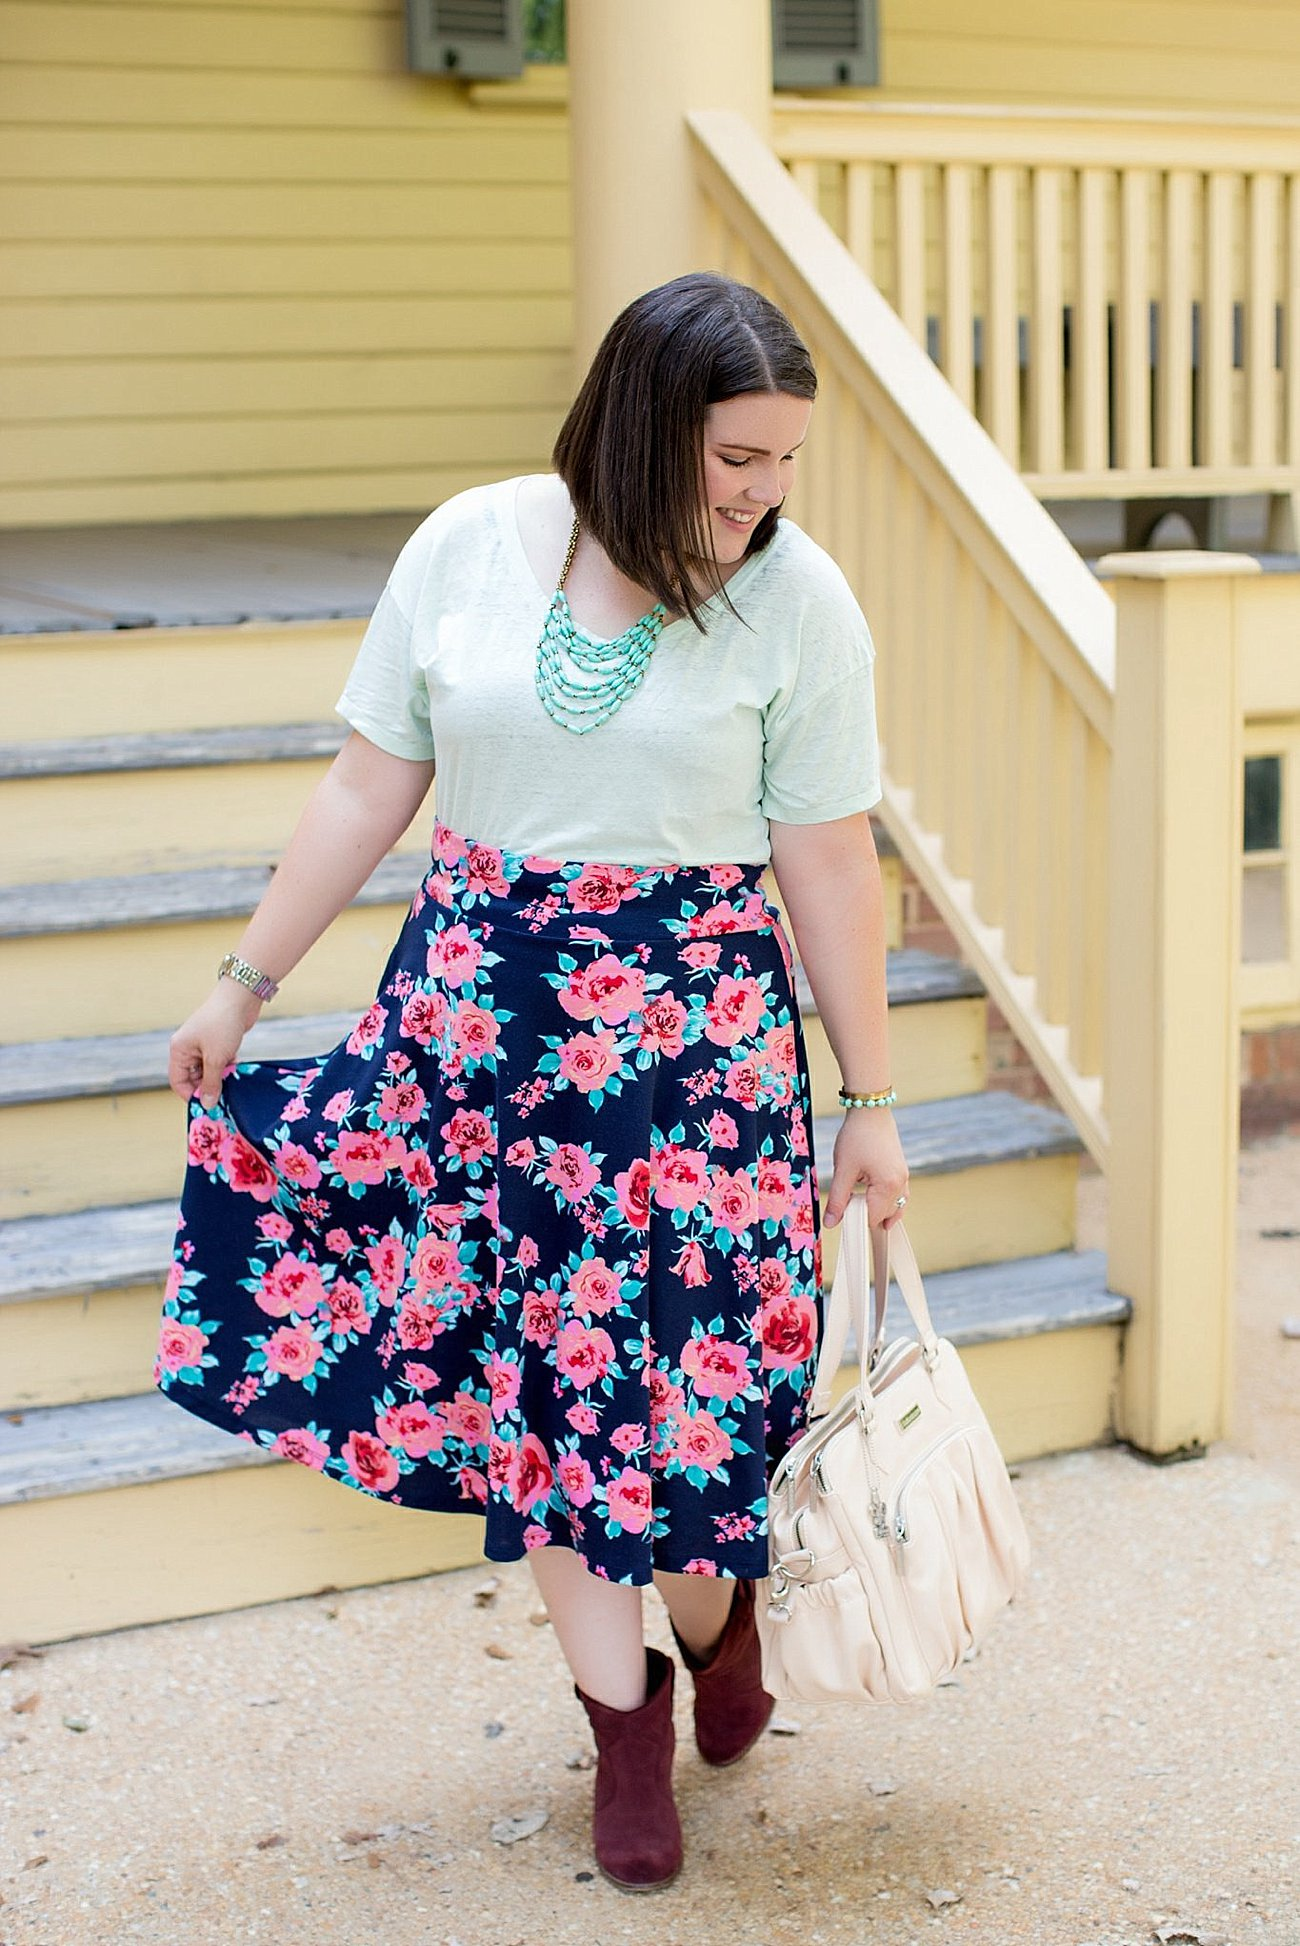 Threads for Thought tee, Agnes & Dora floral midi skirt, Booties, Kalencom diaper bag (3)